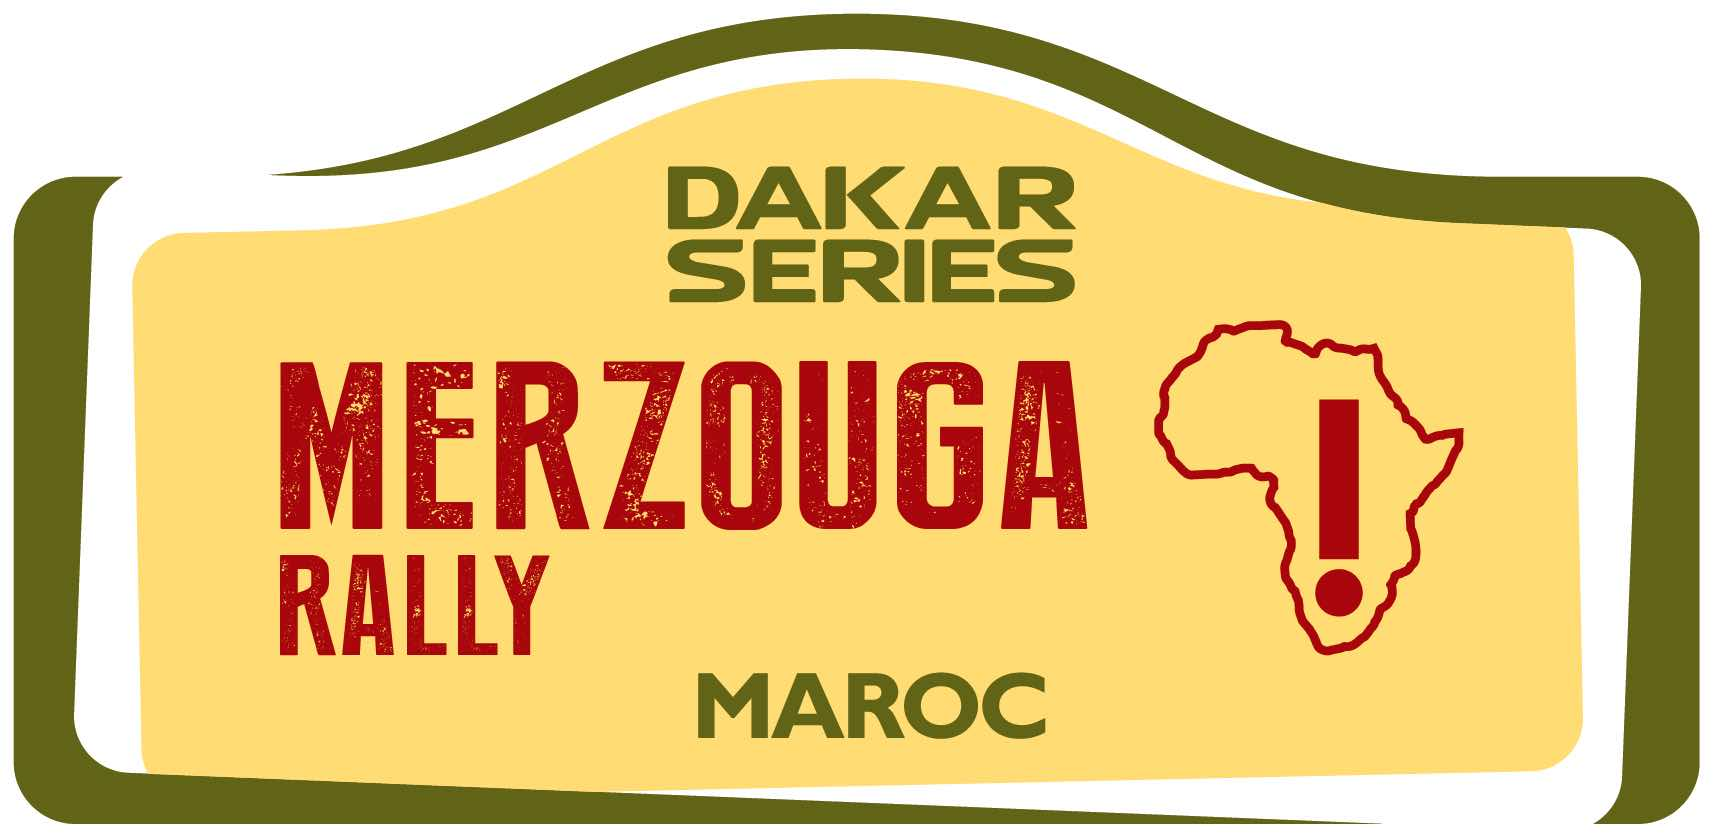 Colingua traduce el Rallye Merzouga en Marruecos